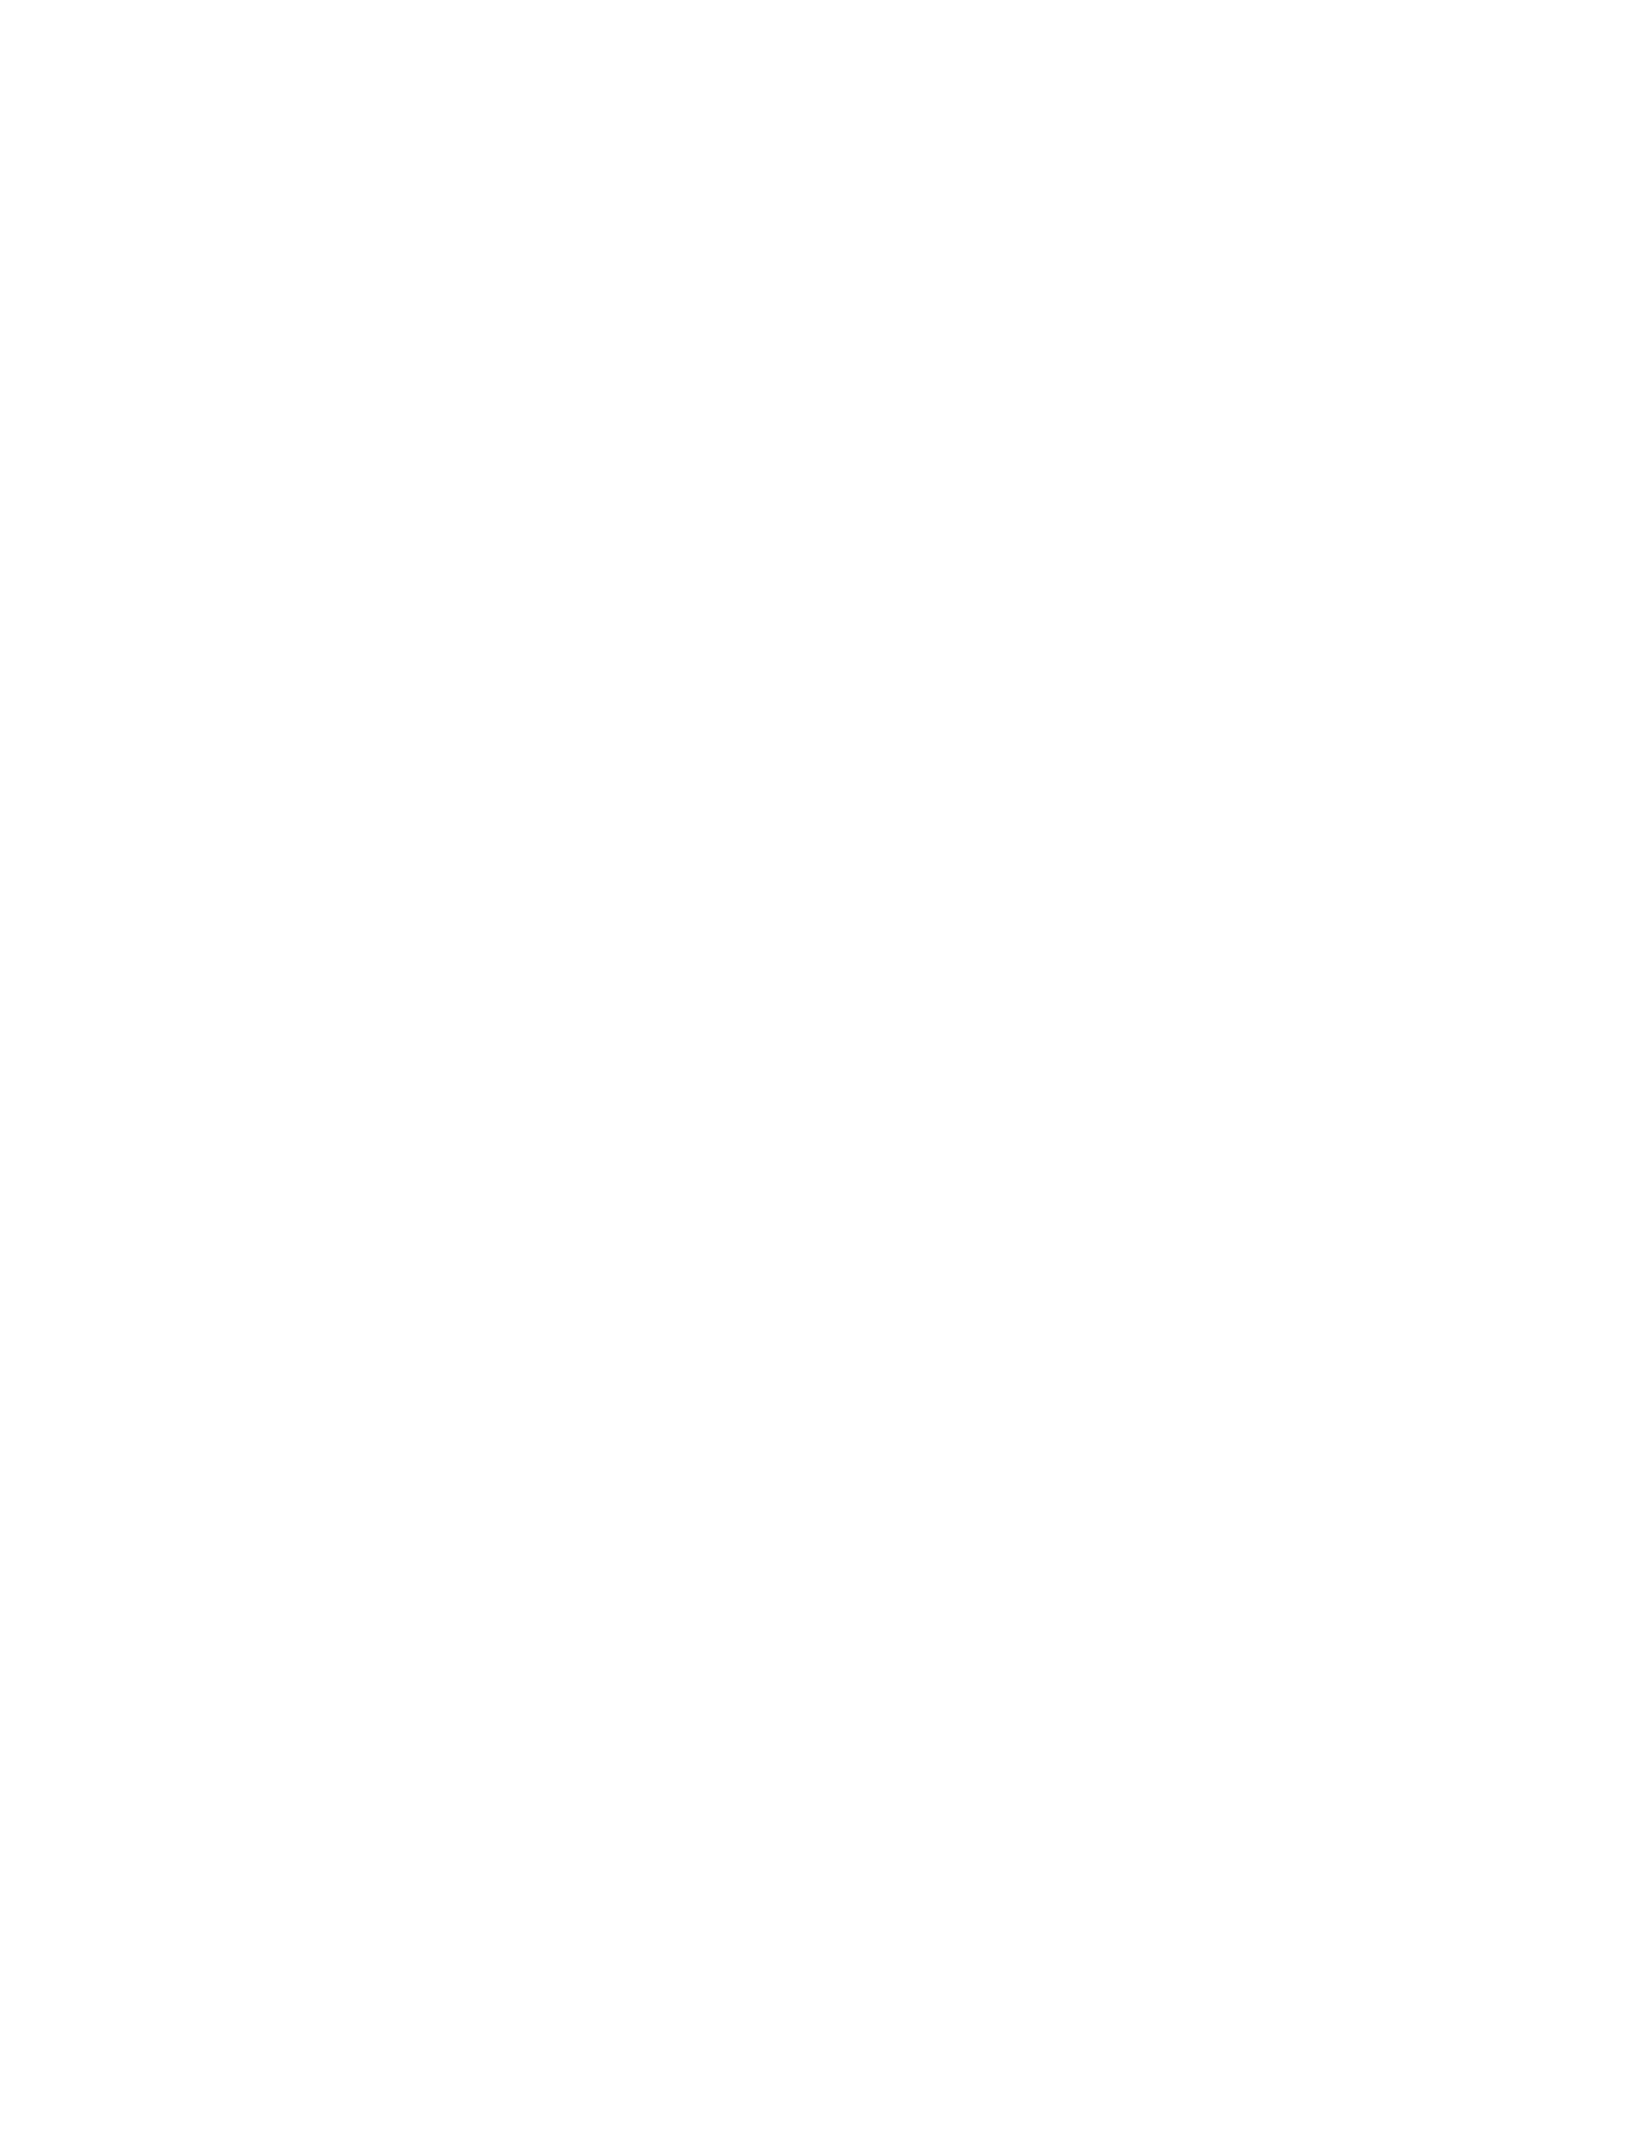 Milanovi aktivity